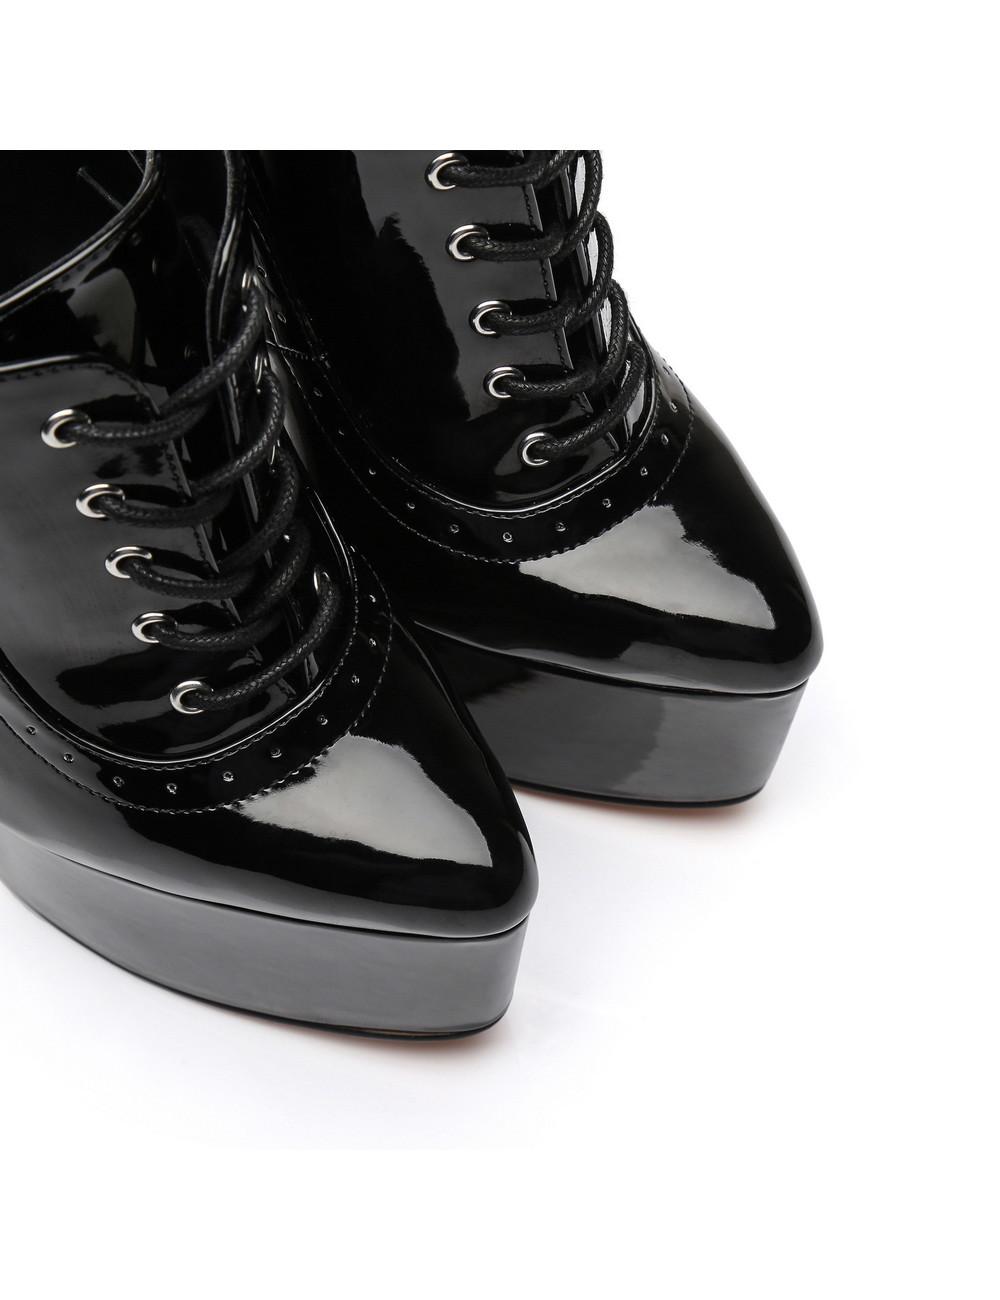 SLICK Black shiny Giaro ultra Fetish platform oxfords with gold heels